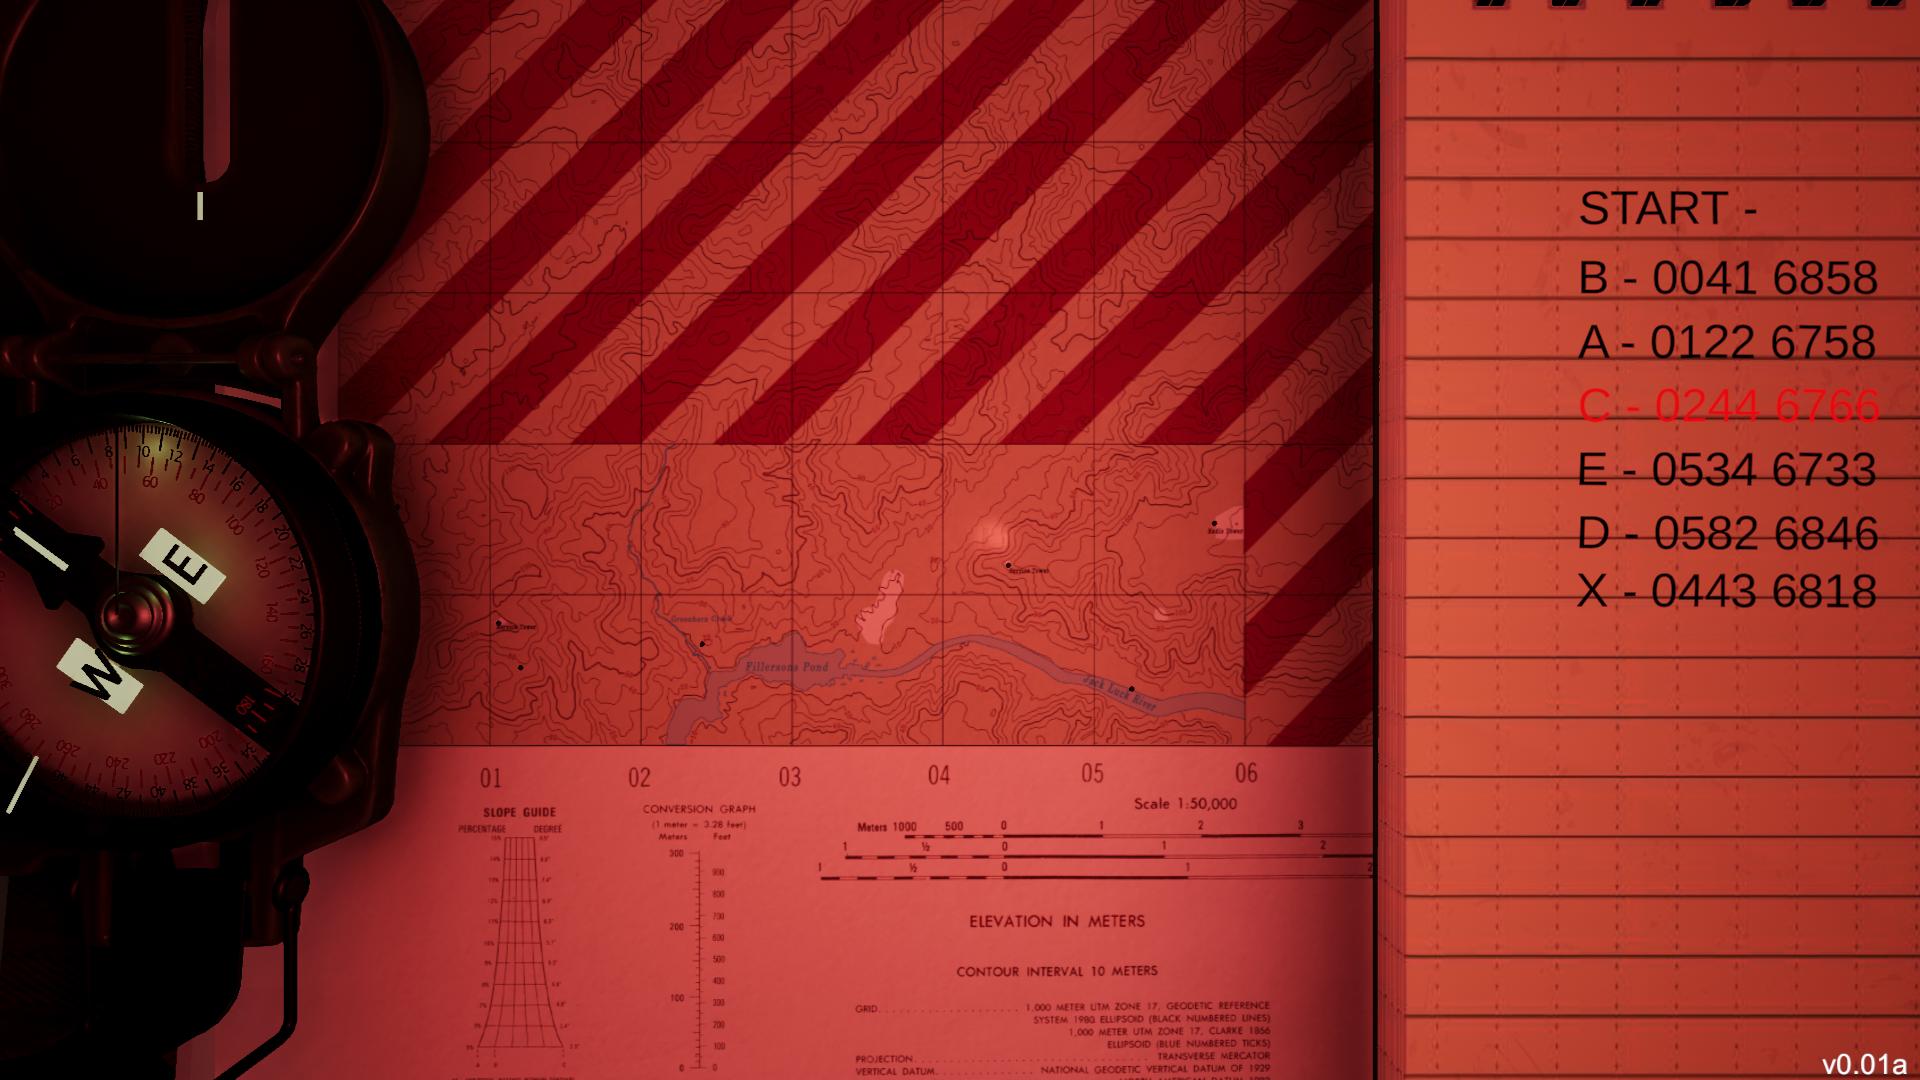 Desktop Screenshot 2020.02.04 - 17.16.57.24.png